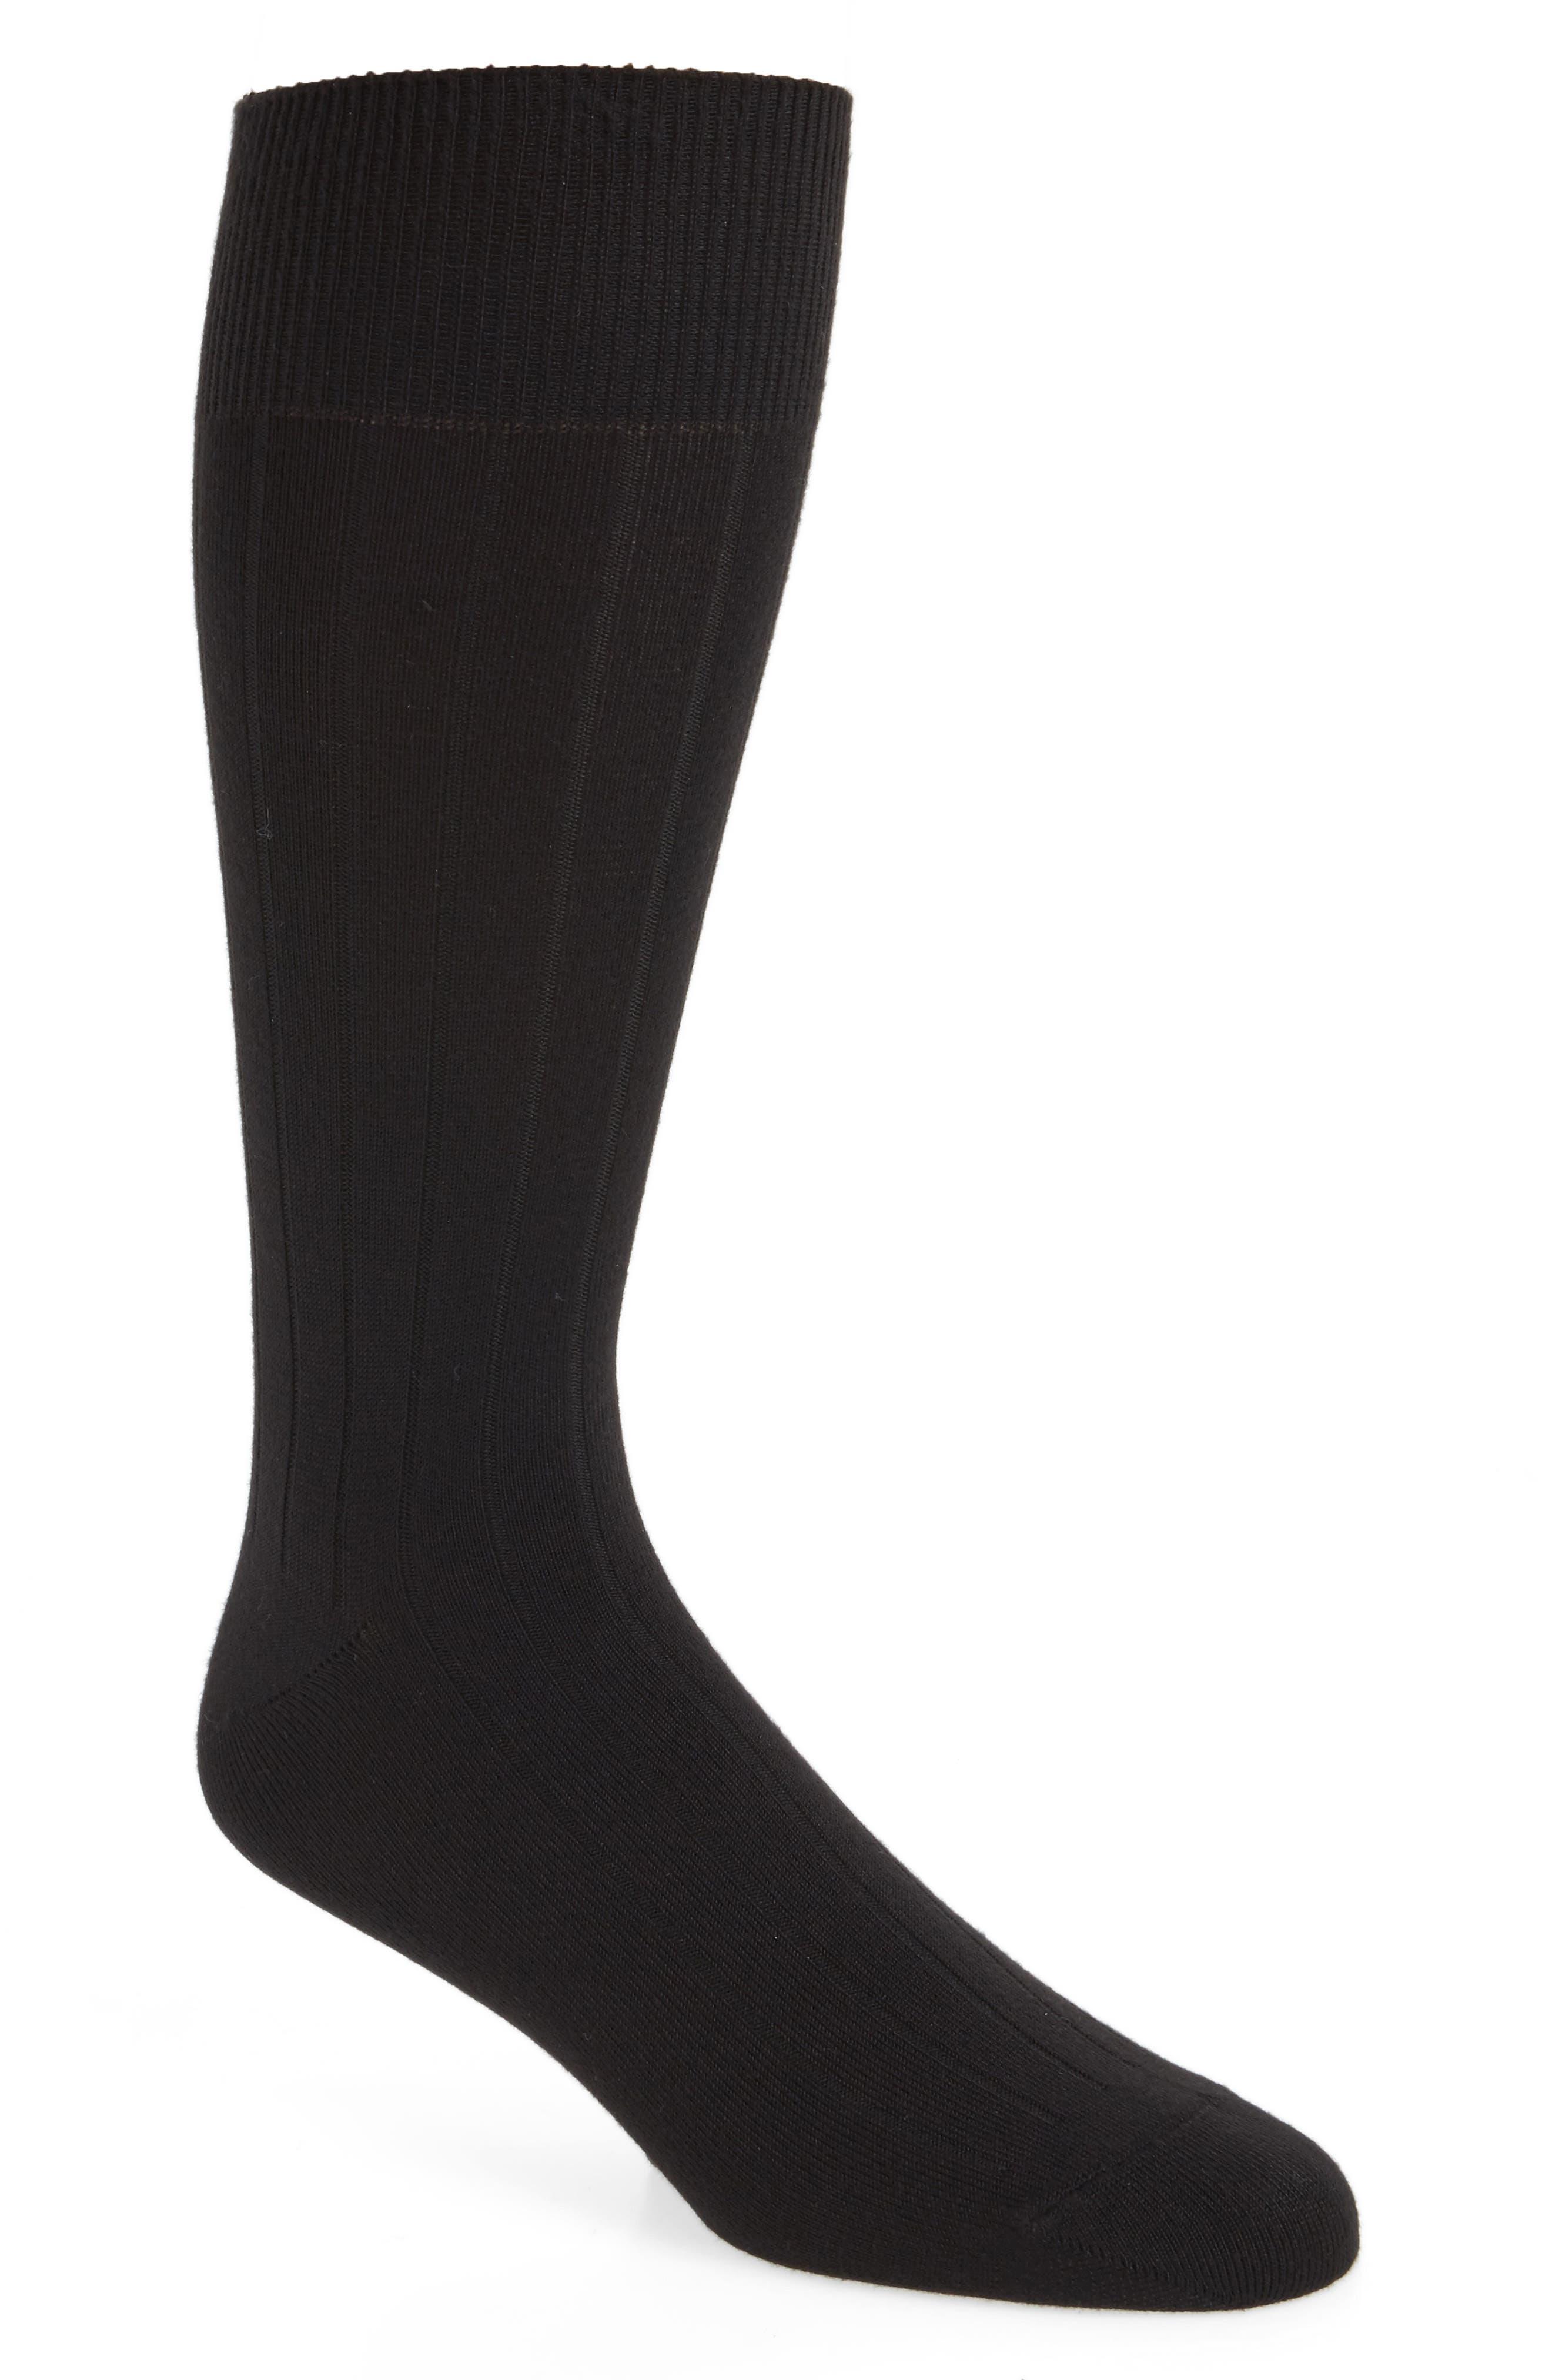 NORDSTROM MEN'S SHOP, Ultra Soft Solid Ribbed Socks, Main thumbnail 1, color, BLACK